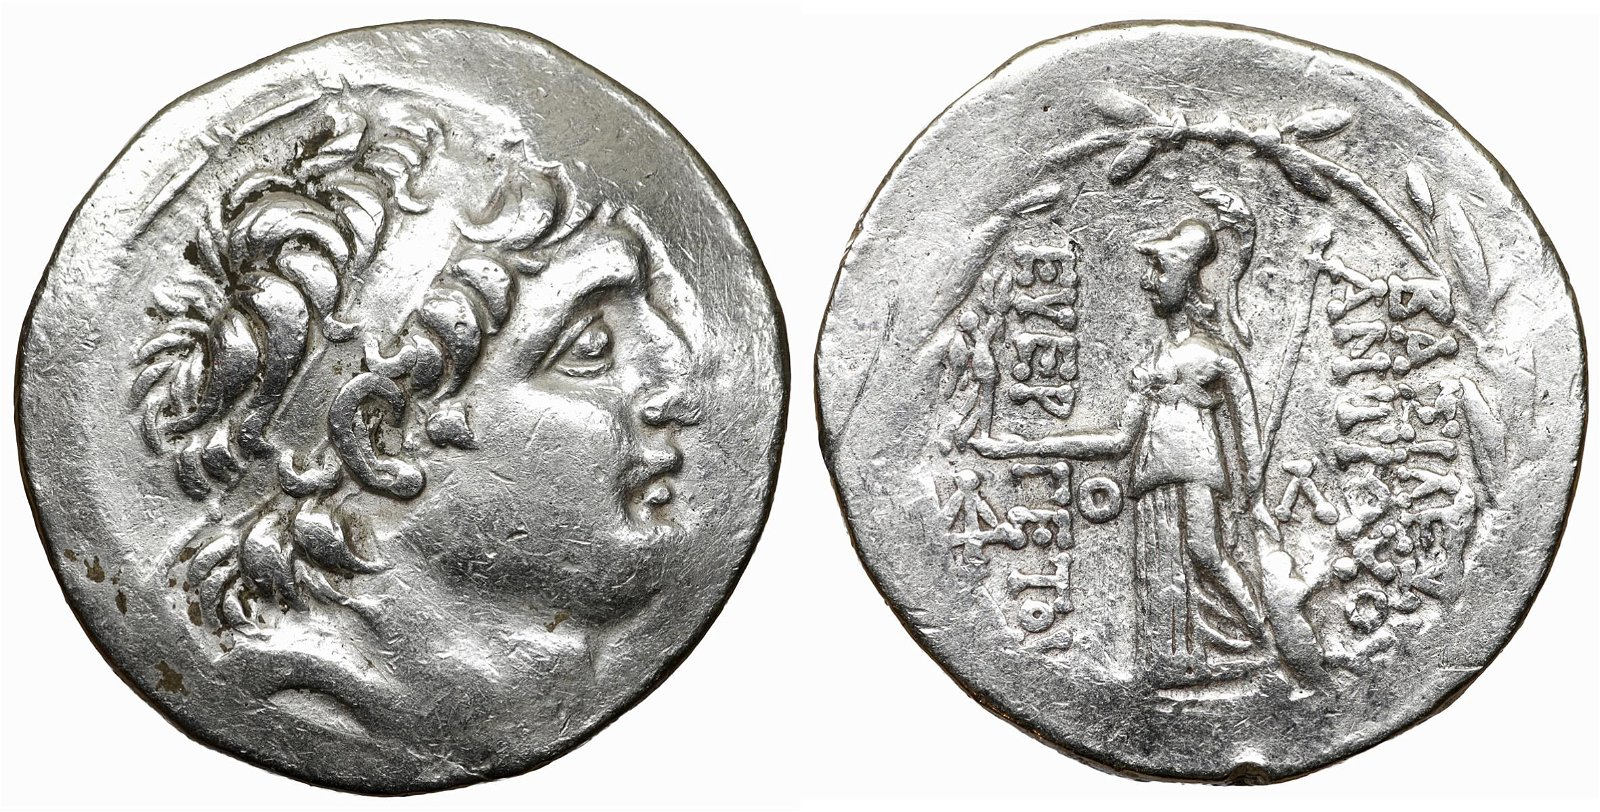 SELEUCID Antiochus VII 138-129 BC Silver Tetradrachm